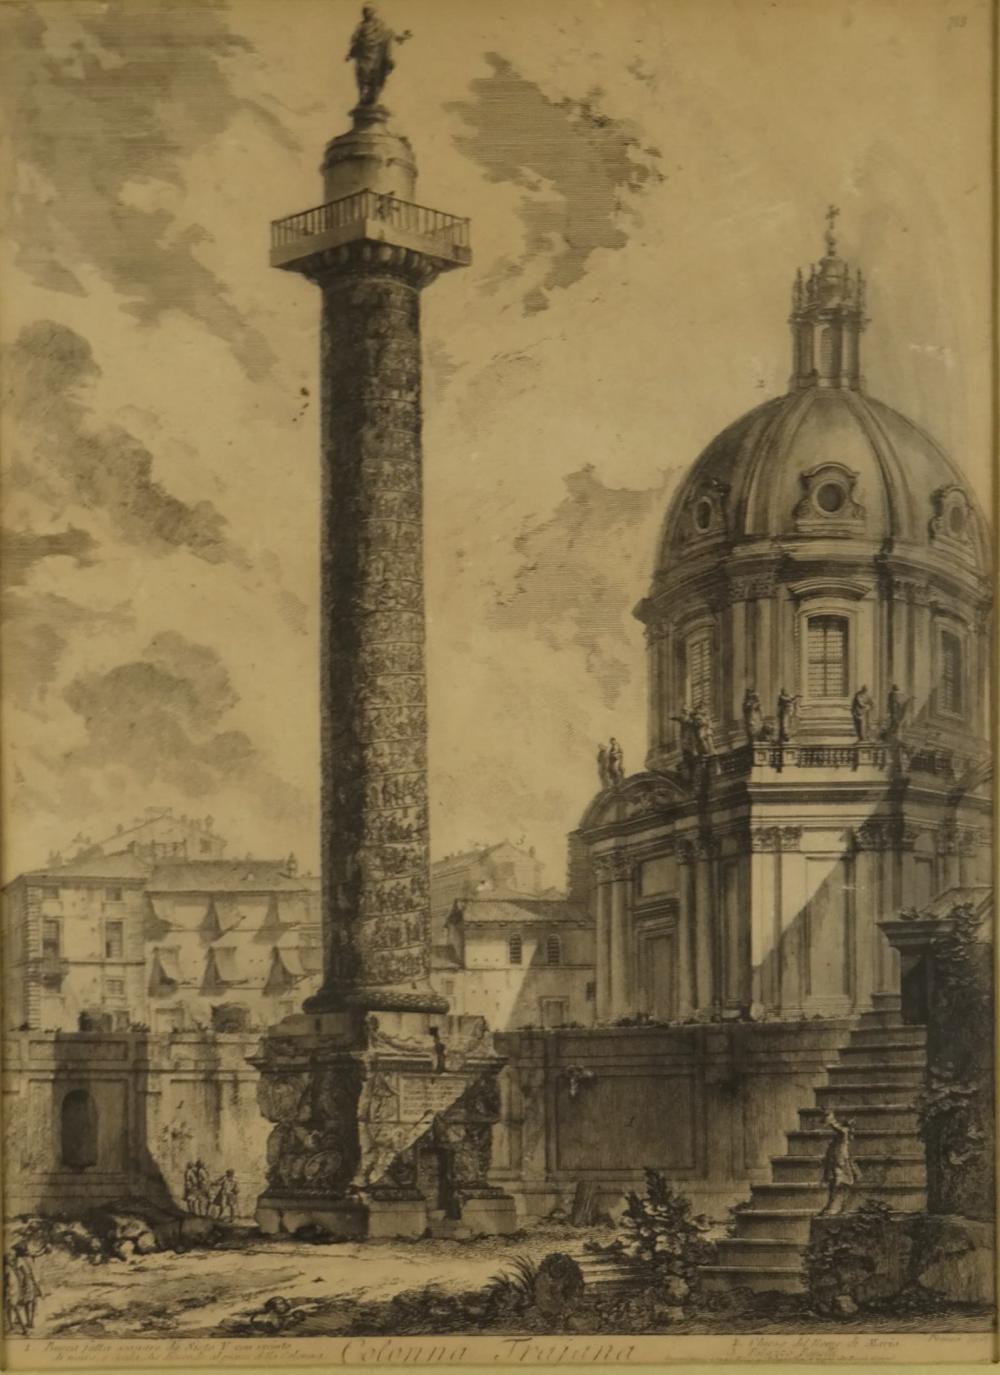 Lot 356: Giovanni Piranesi. Colonna Trajana. 1778-1792.